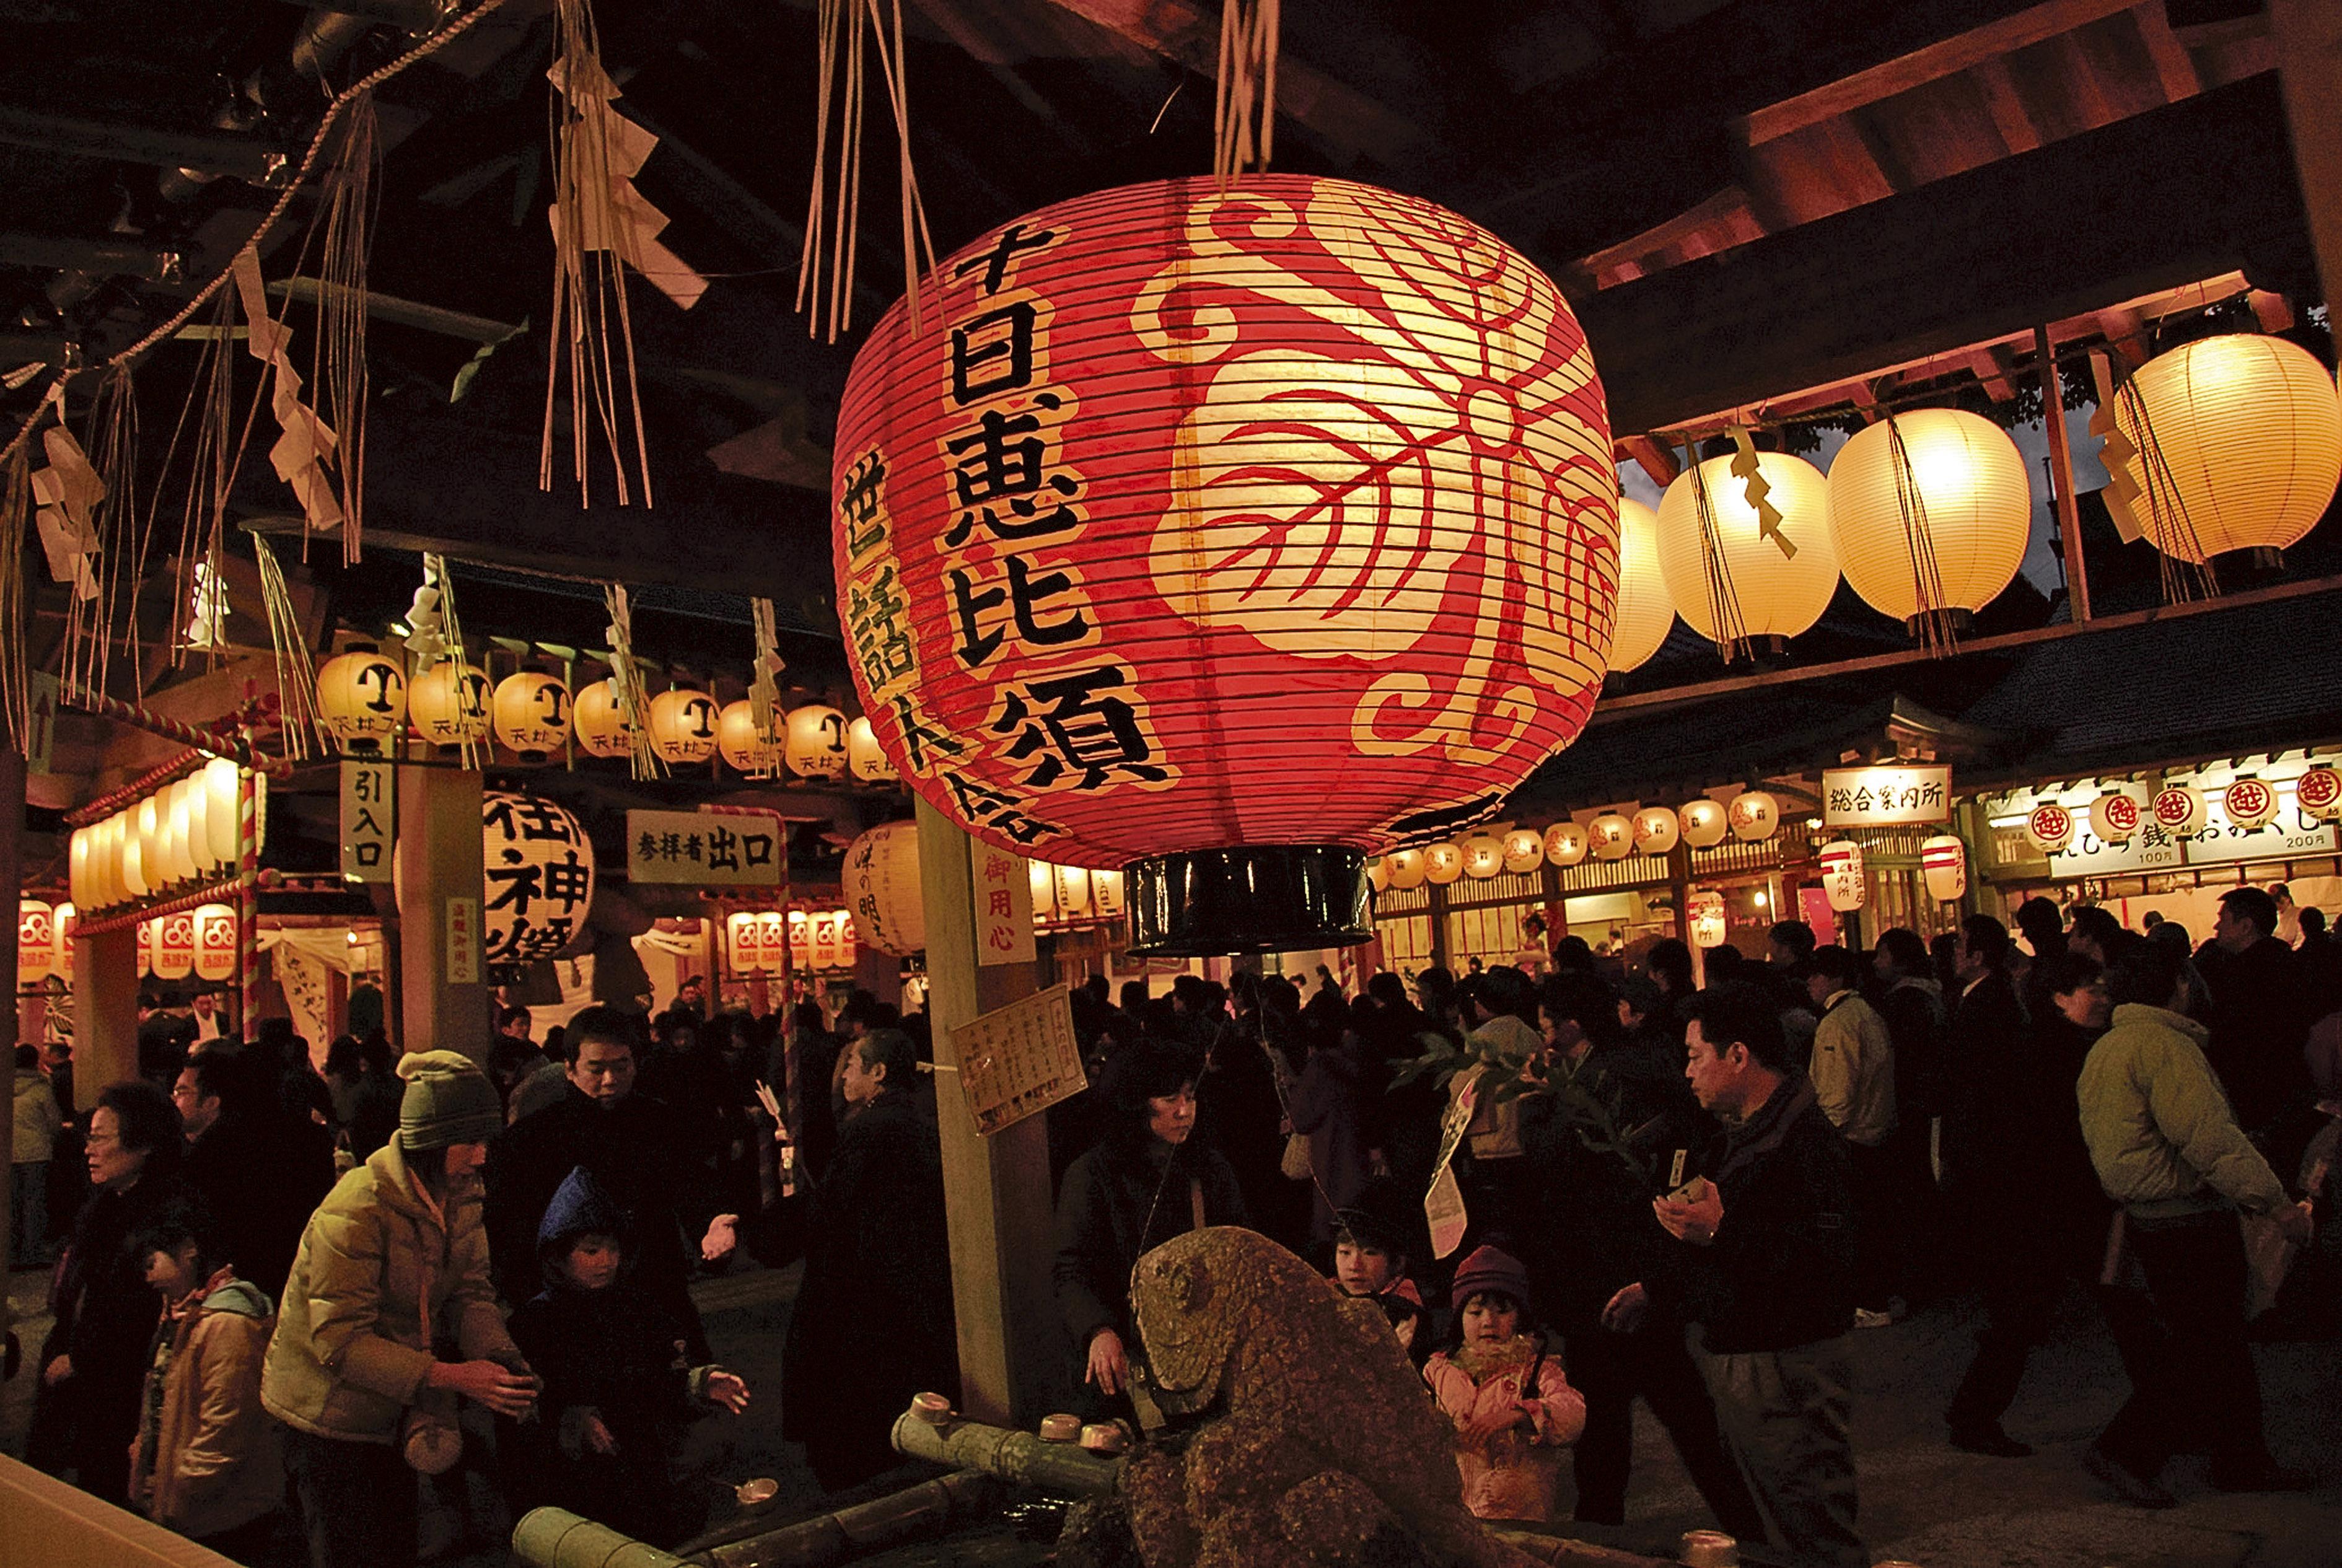 十日恵比須(2007)の画像